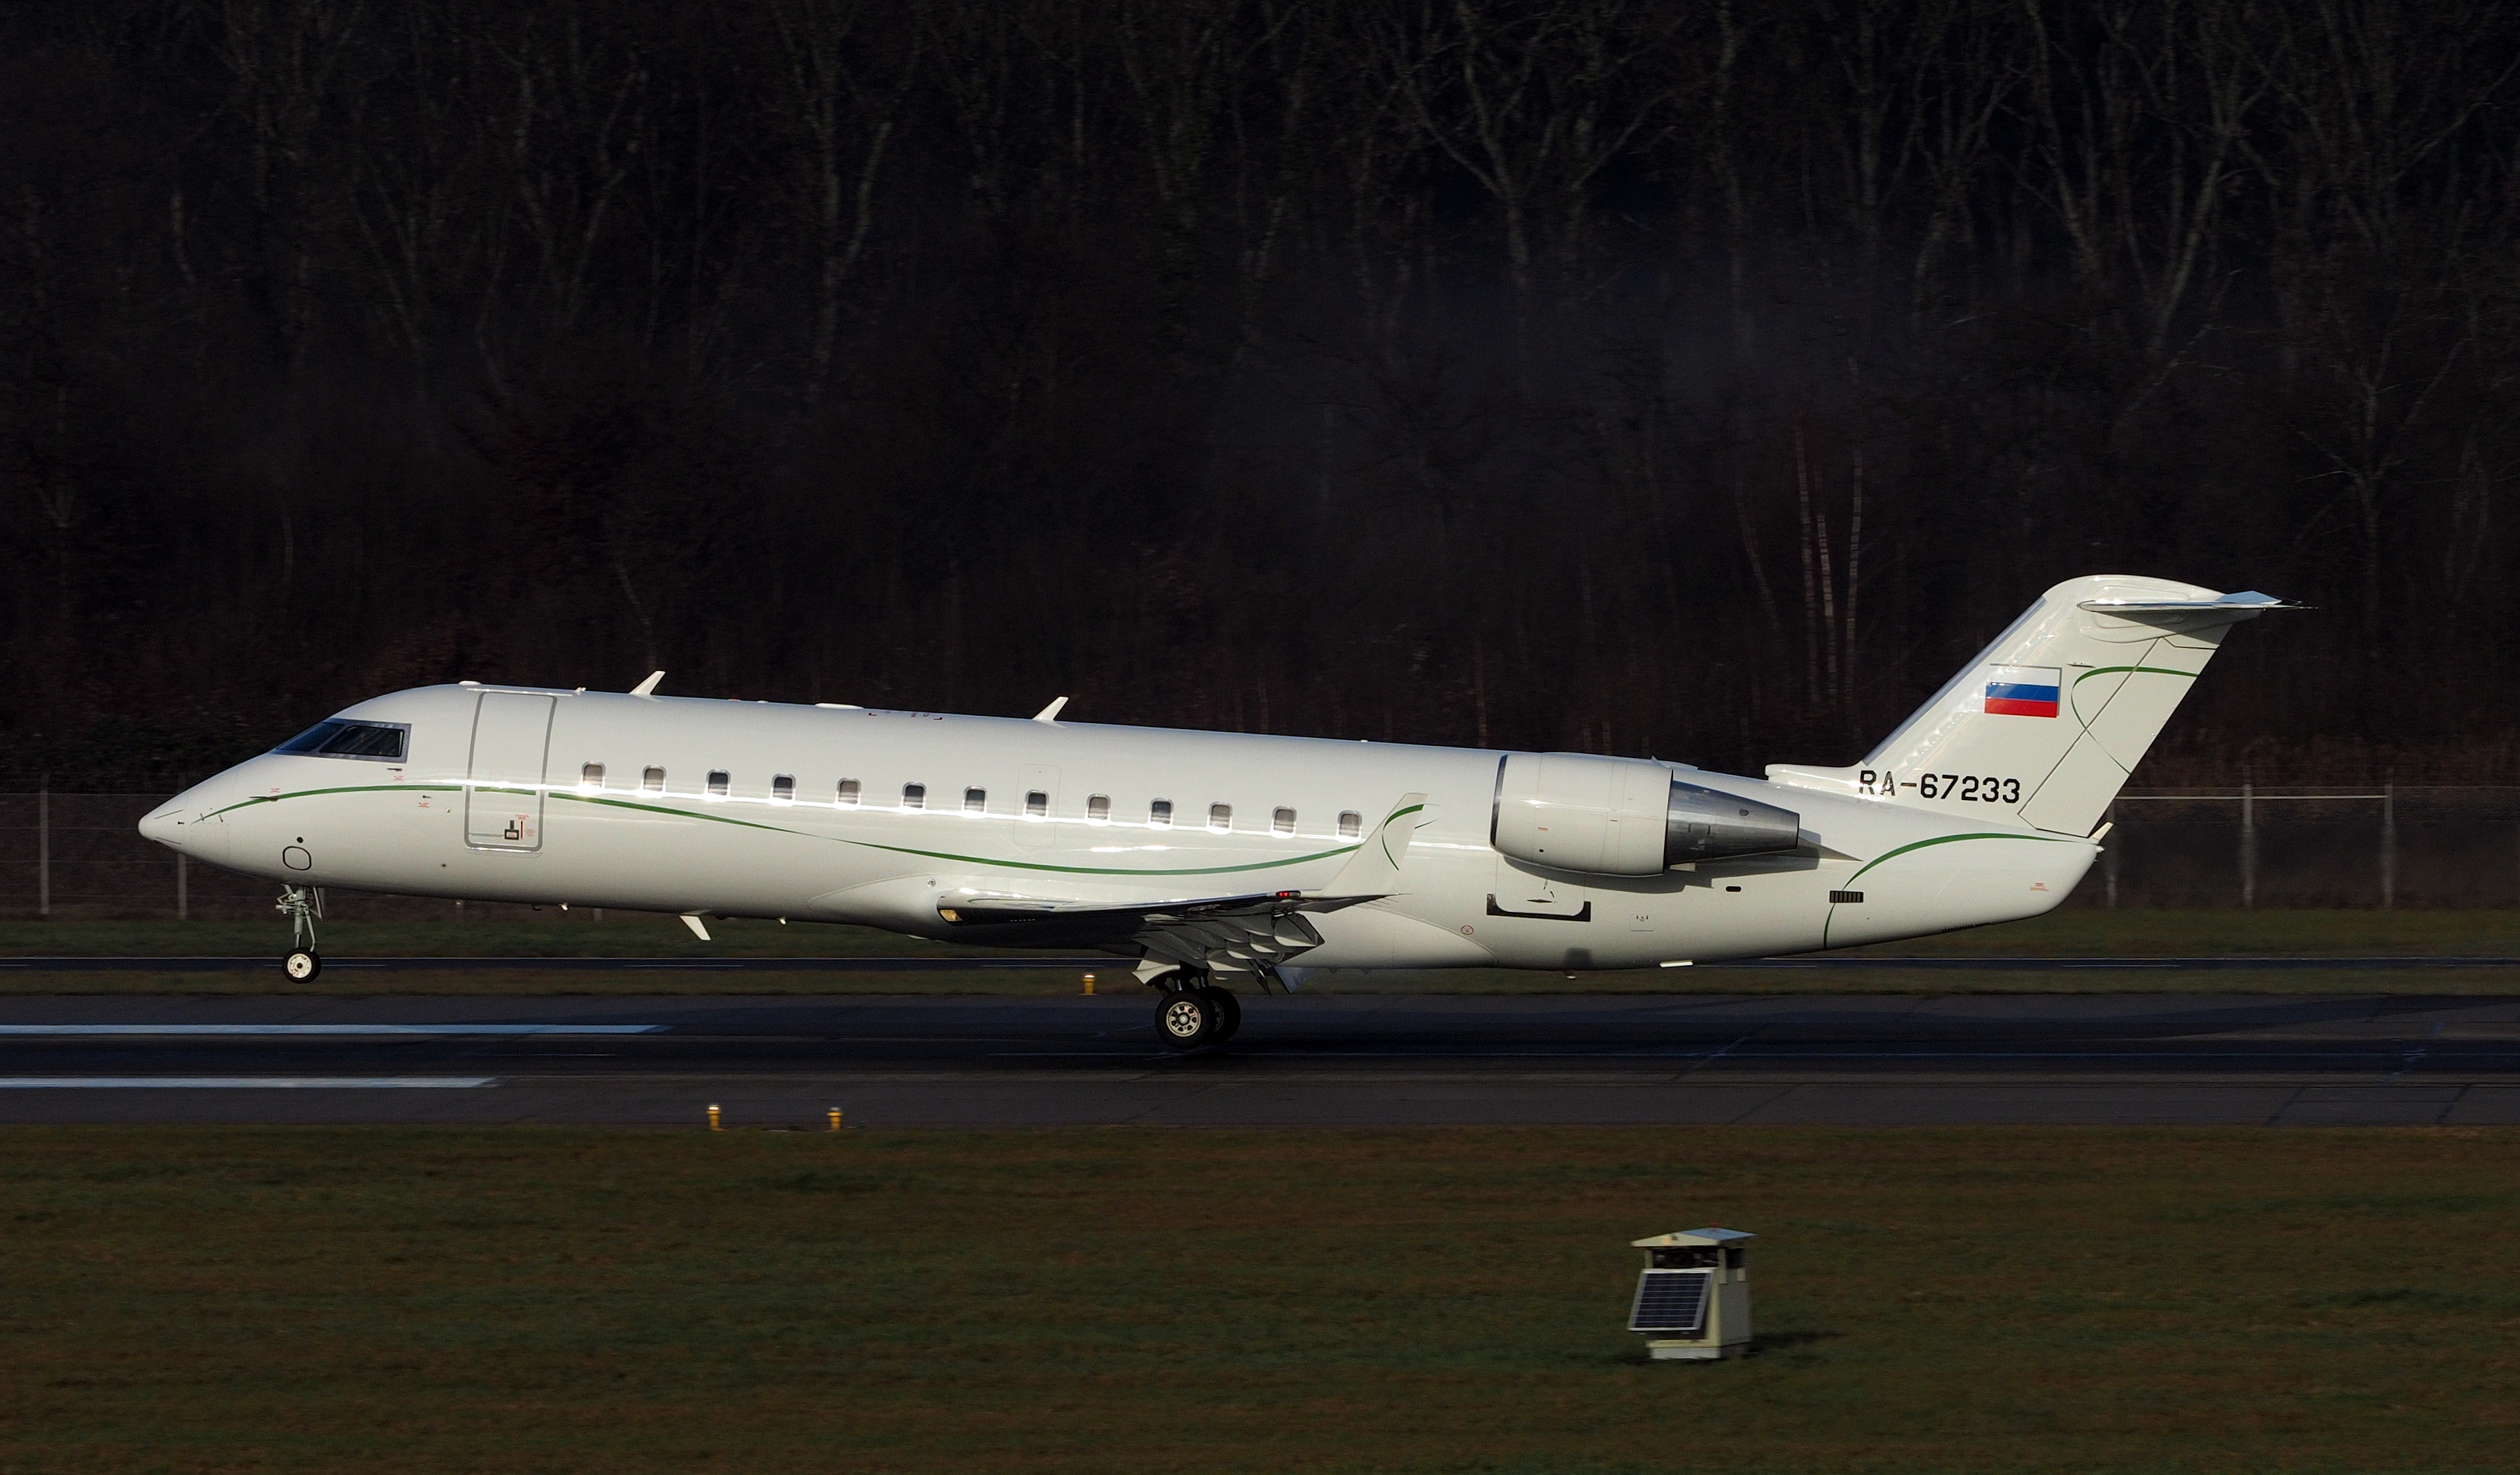 File:Canadair CL-600-2B19 Challenger 850 RA-67233 (15999475407)